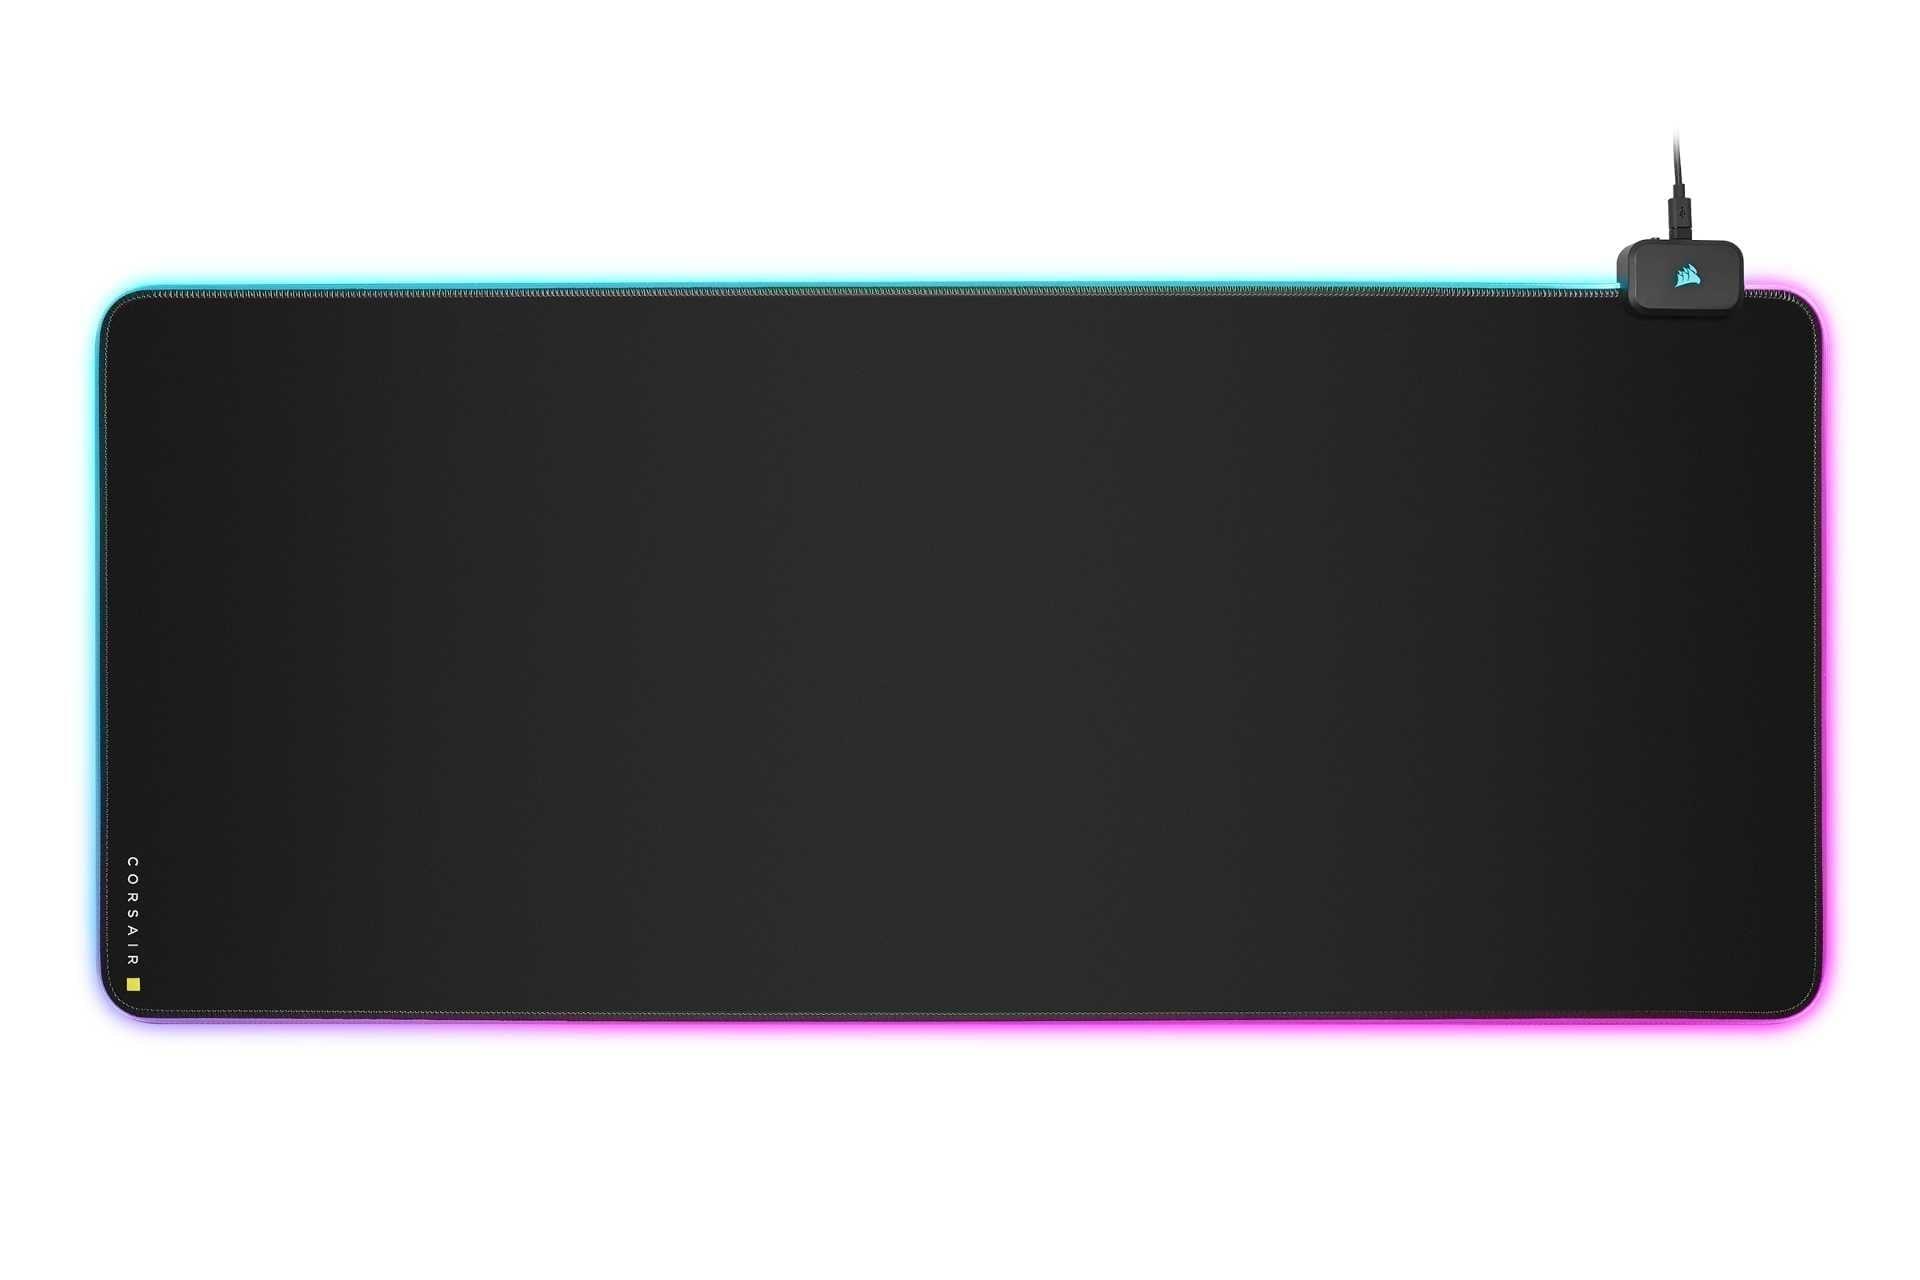 MM700 RGB Extended Gaming-Mauspad